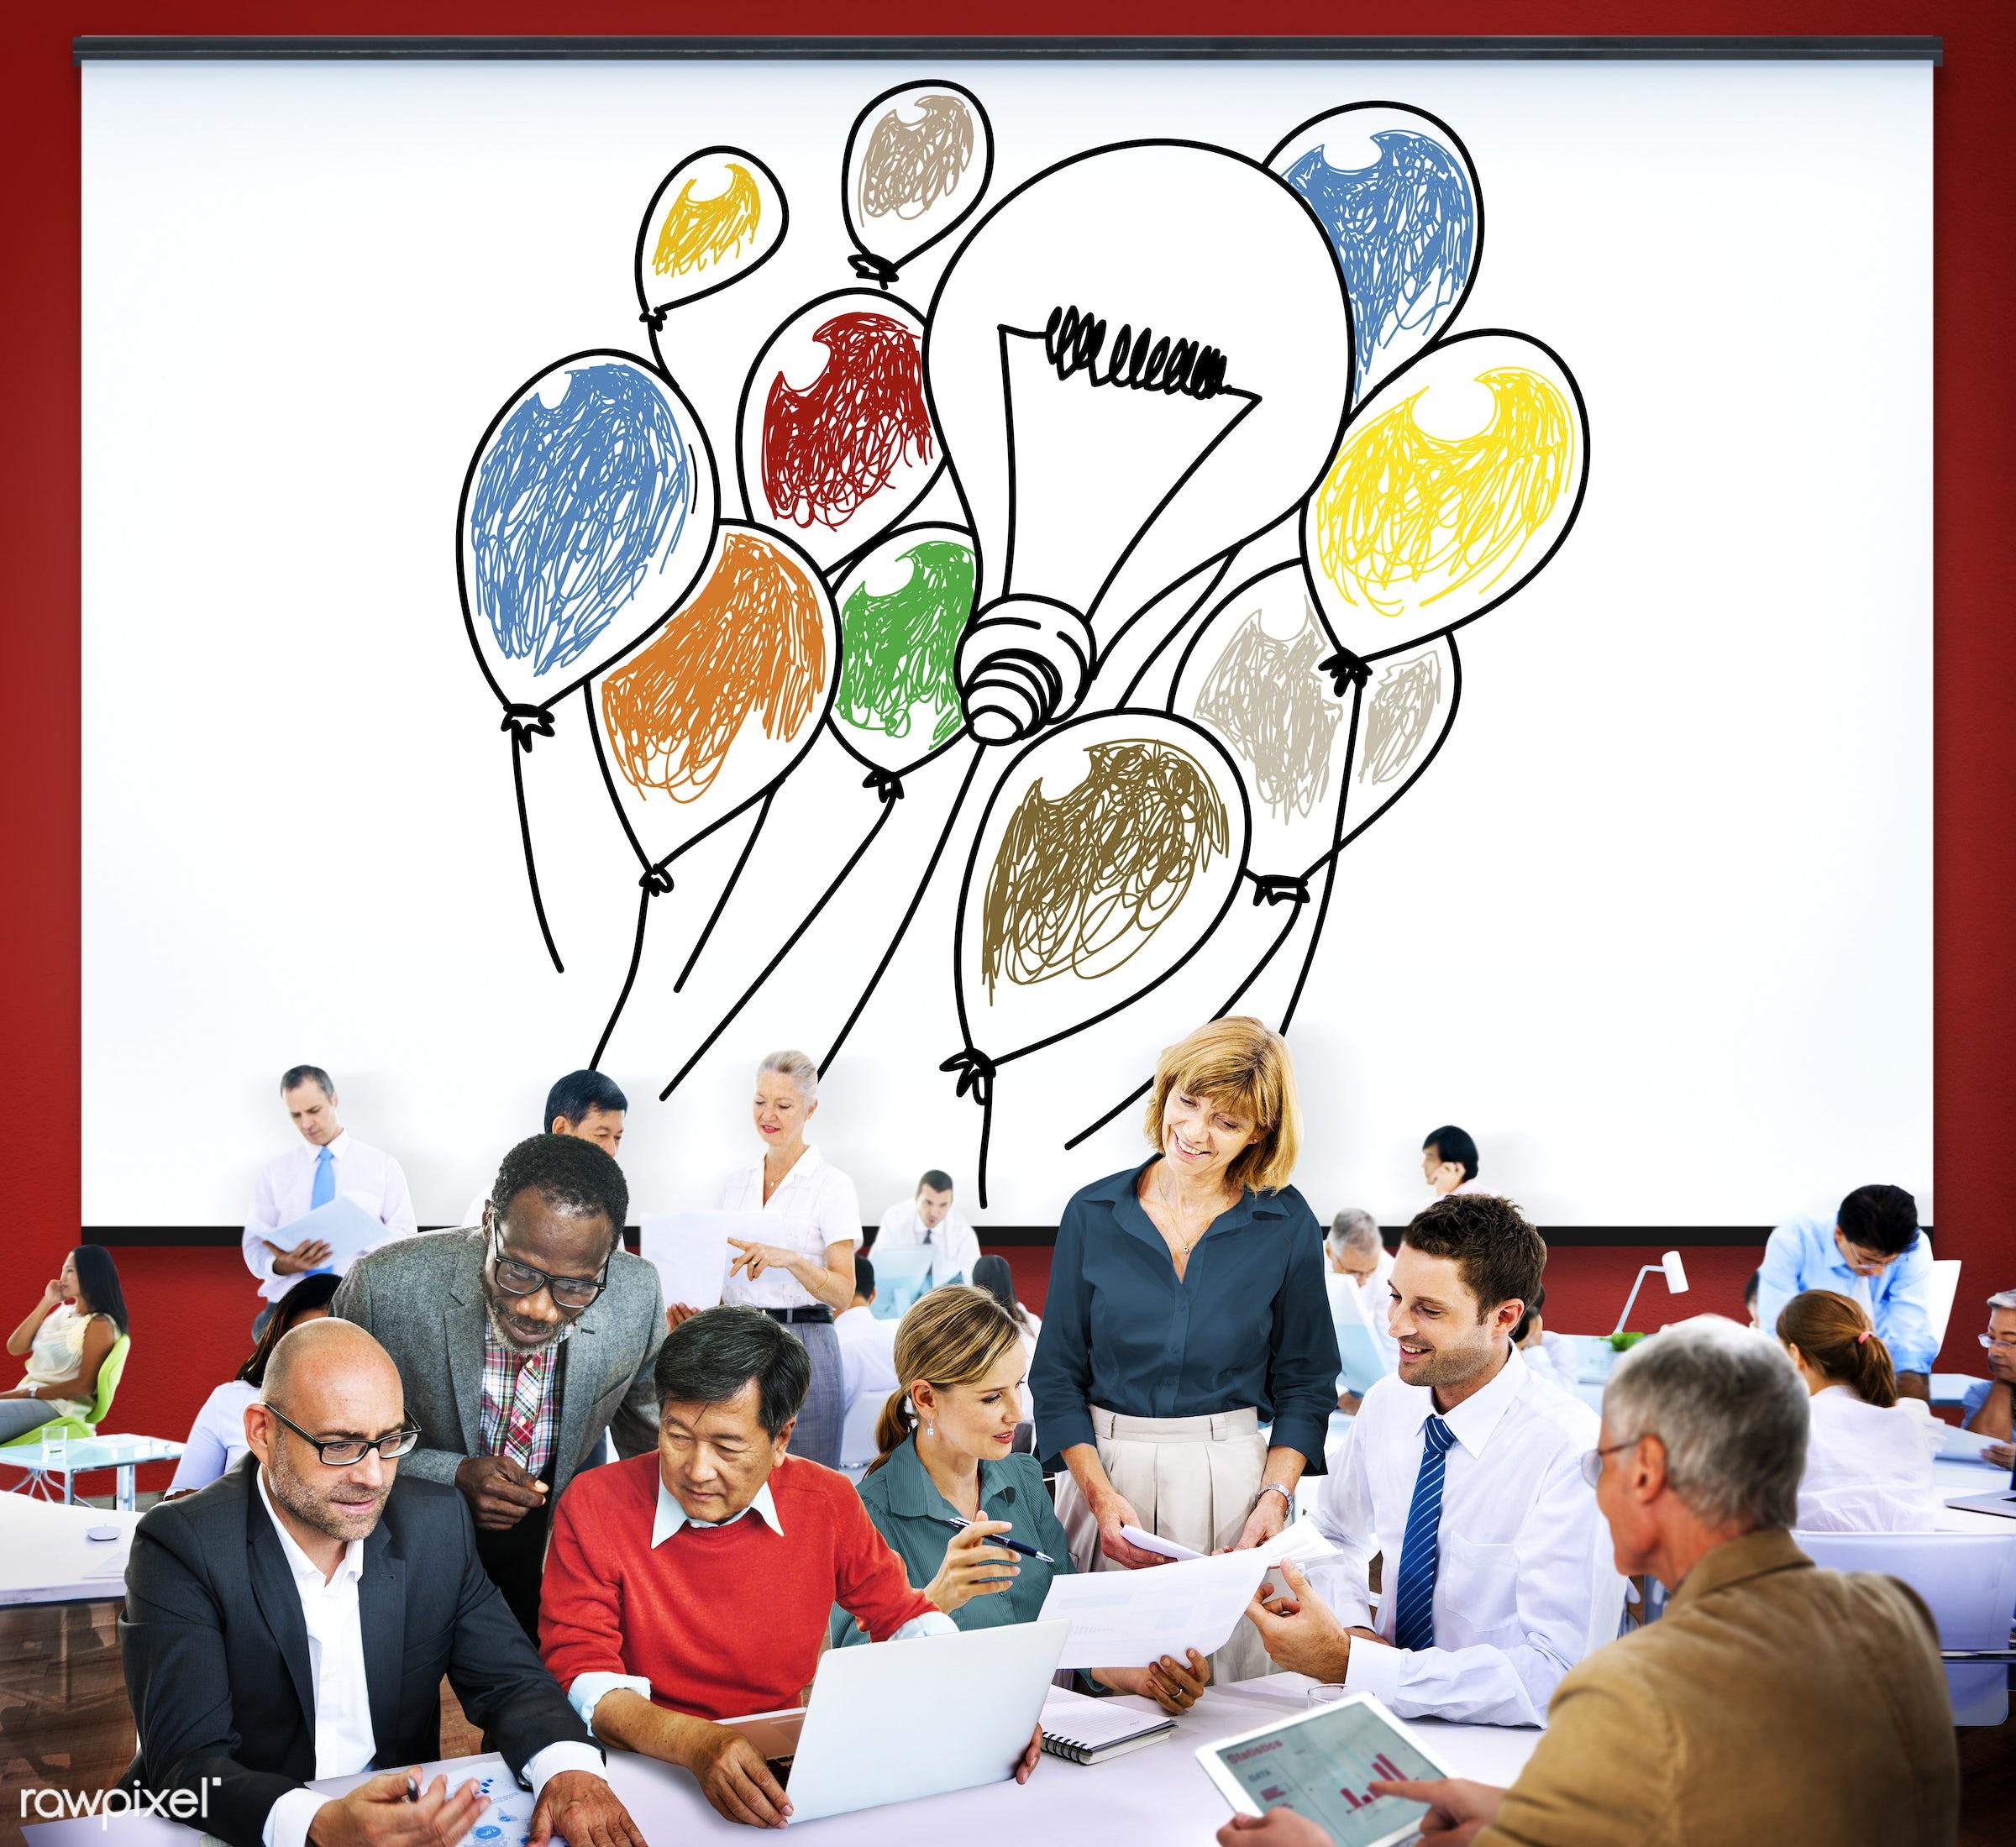 analysis, balloons, brainstorm, brainstorming, business, business people, businessmen, businesswomen, busy, communication,...